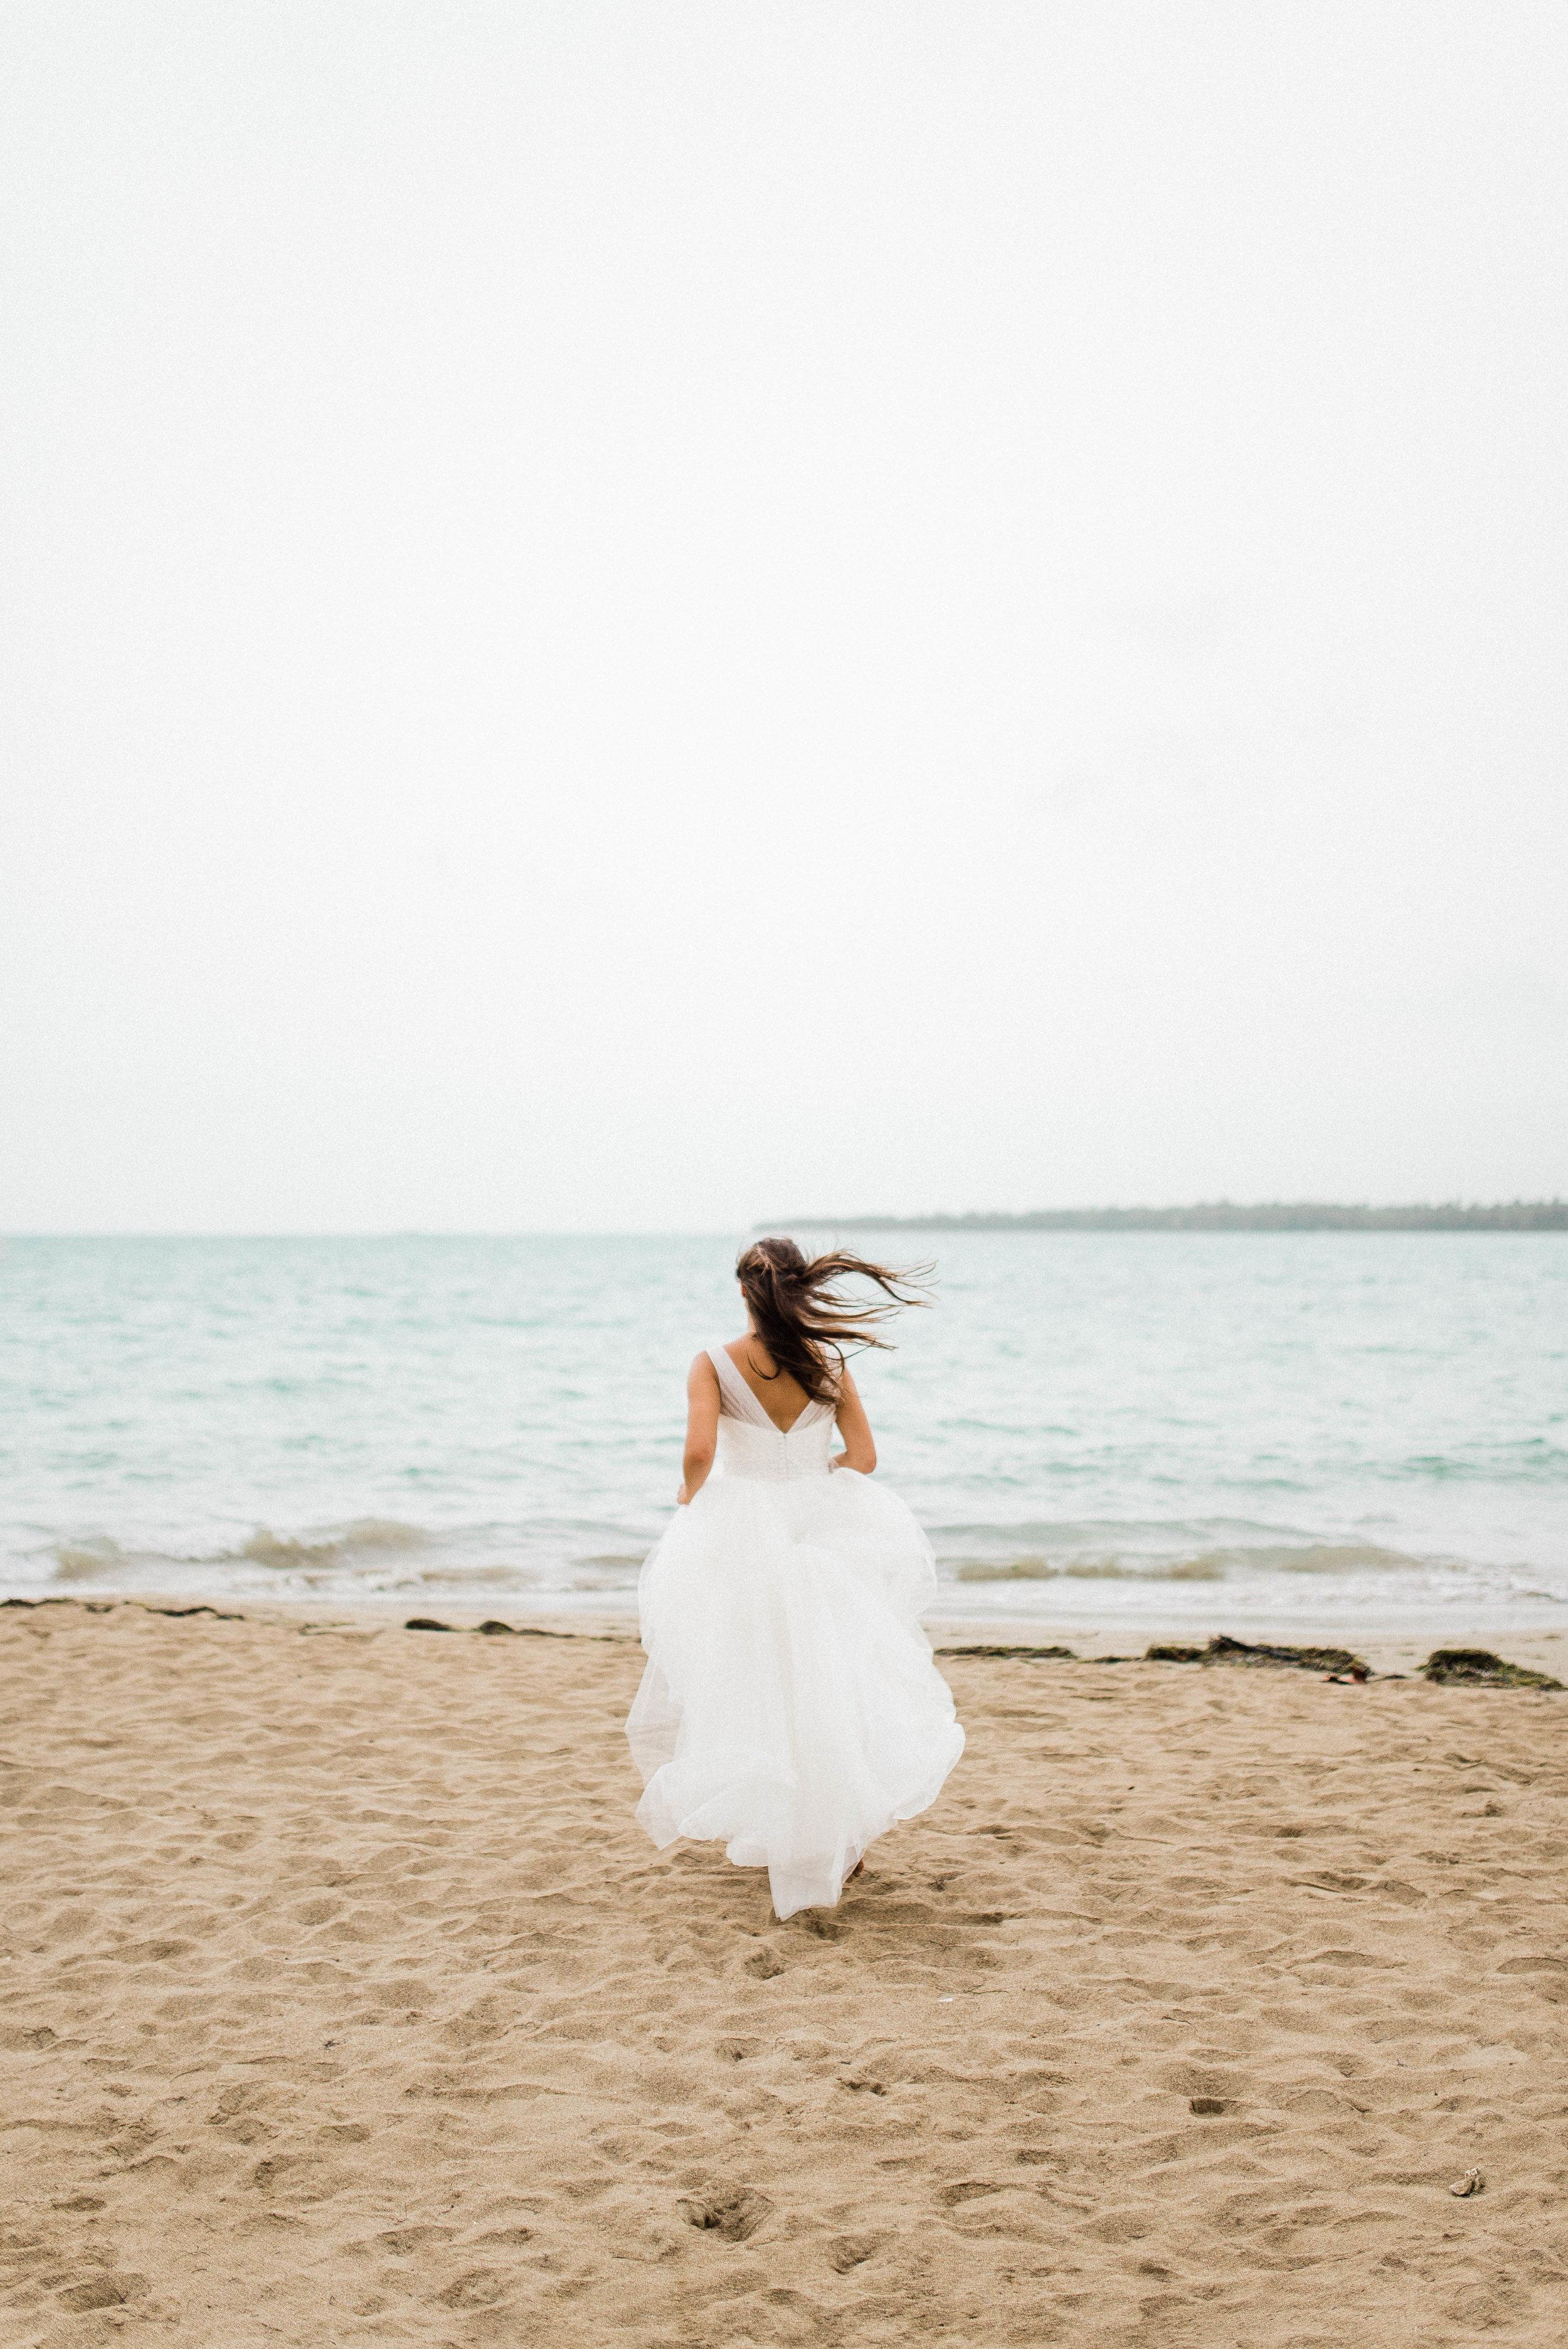 Michaella + Javi | Romantic Bilingual Catholic Mass & Oceanside Fiesta on the Beach in Puerto Plata, Dominican Republic | Indianapolis Elopement & International Destination Wedding Photographers